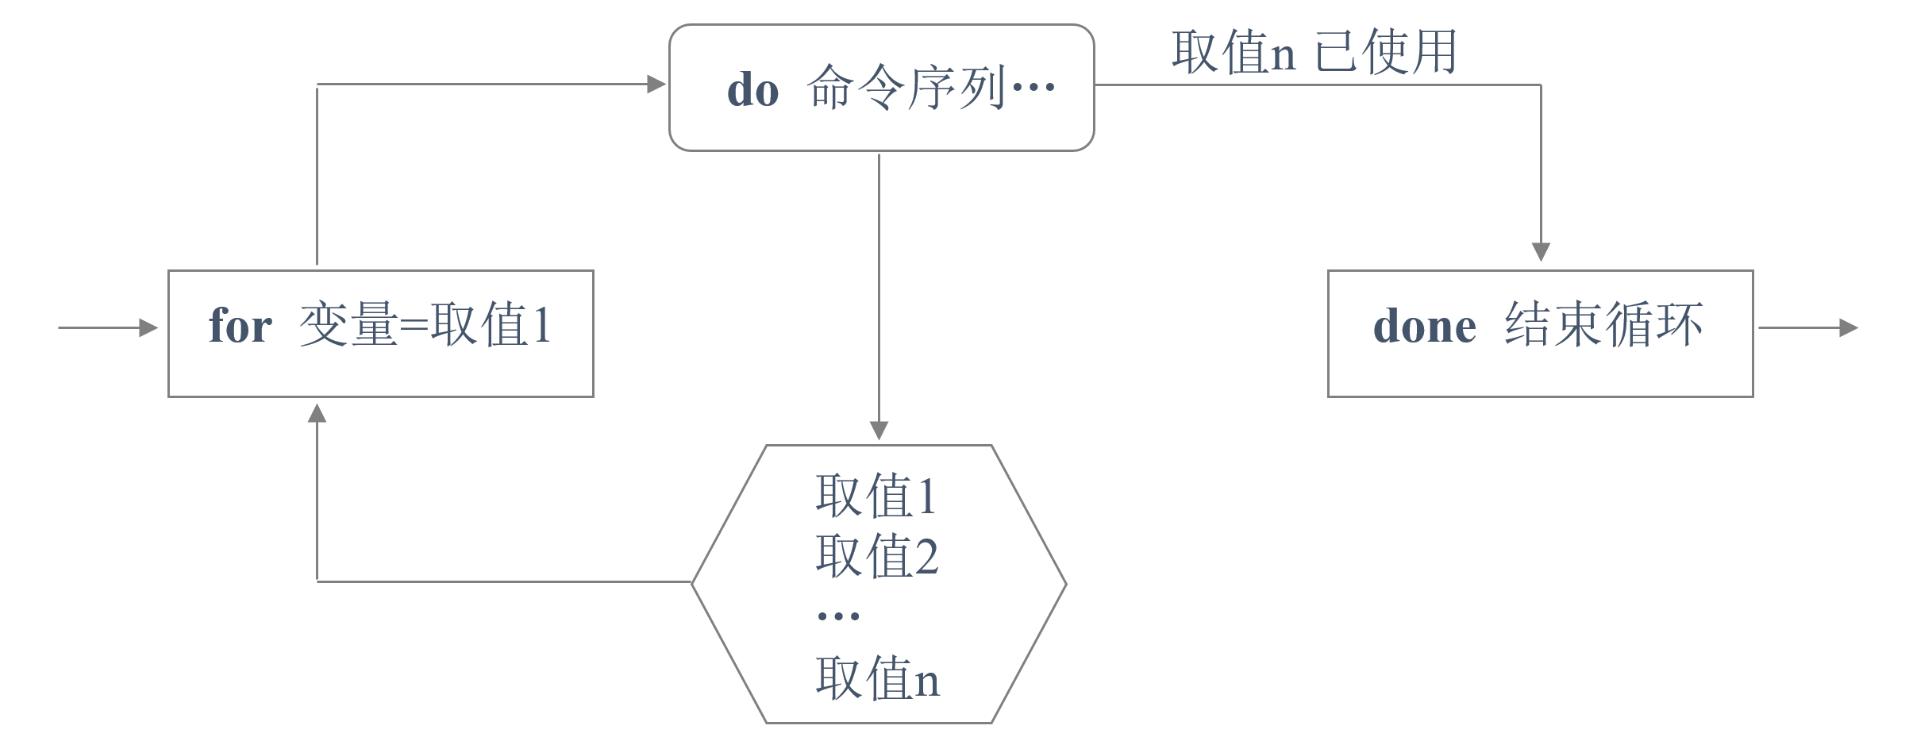 Shell脚本中for循环、while循环及case分支语句